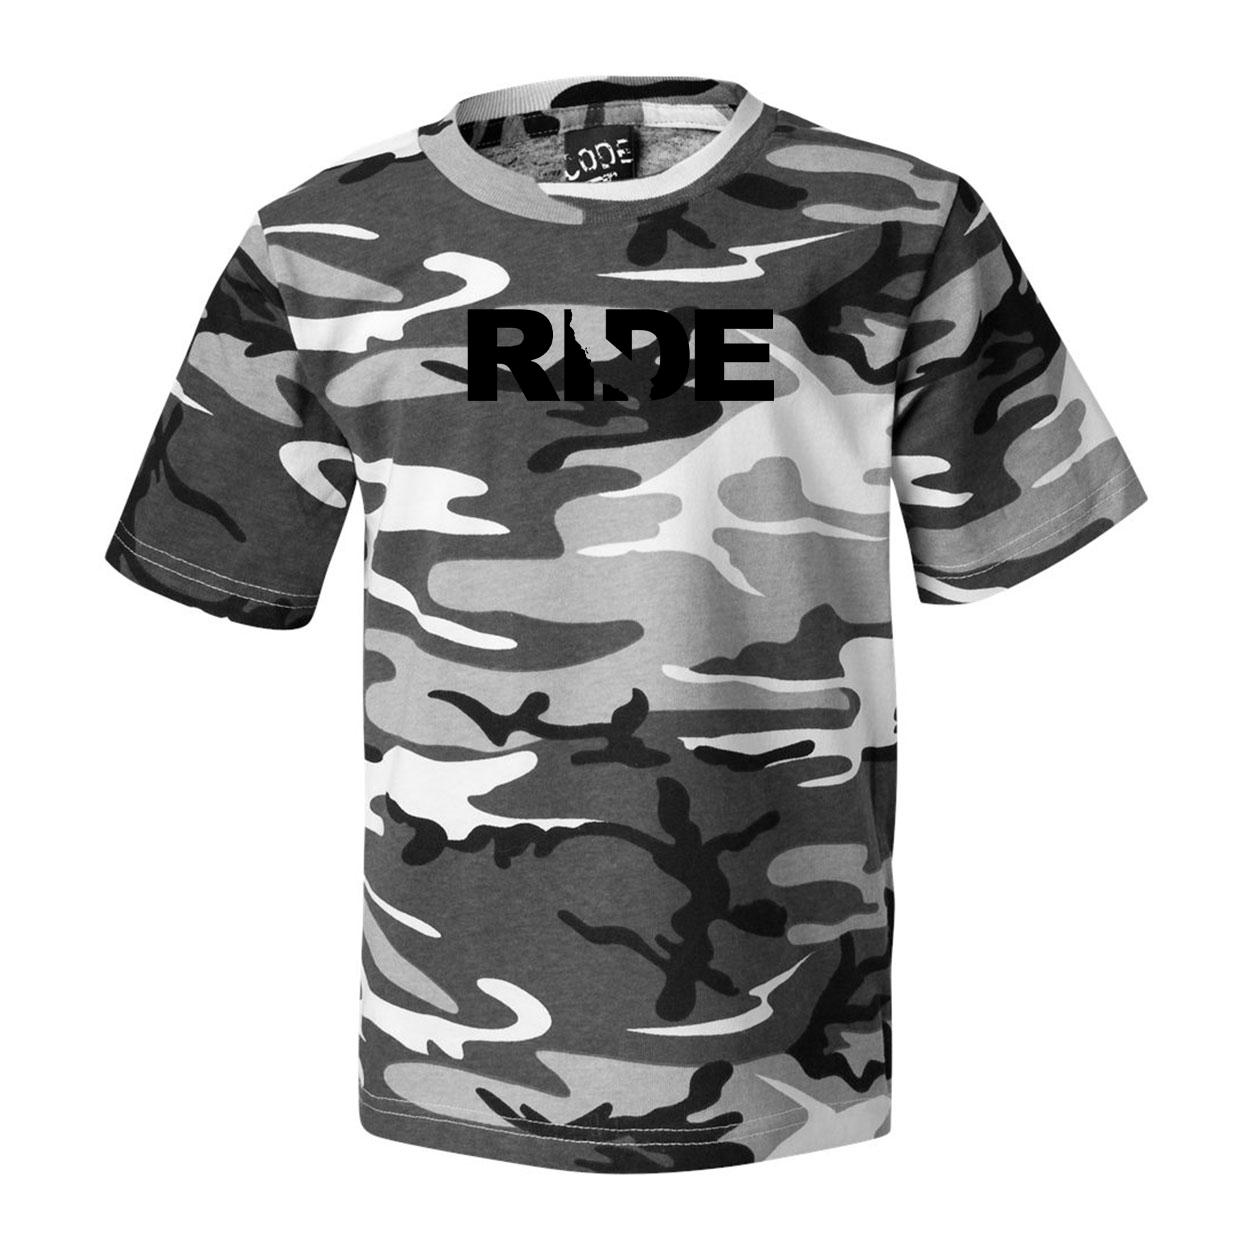 Ride California Classic Premium T-Shirt Urban Camo (Black Logo)